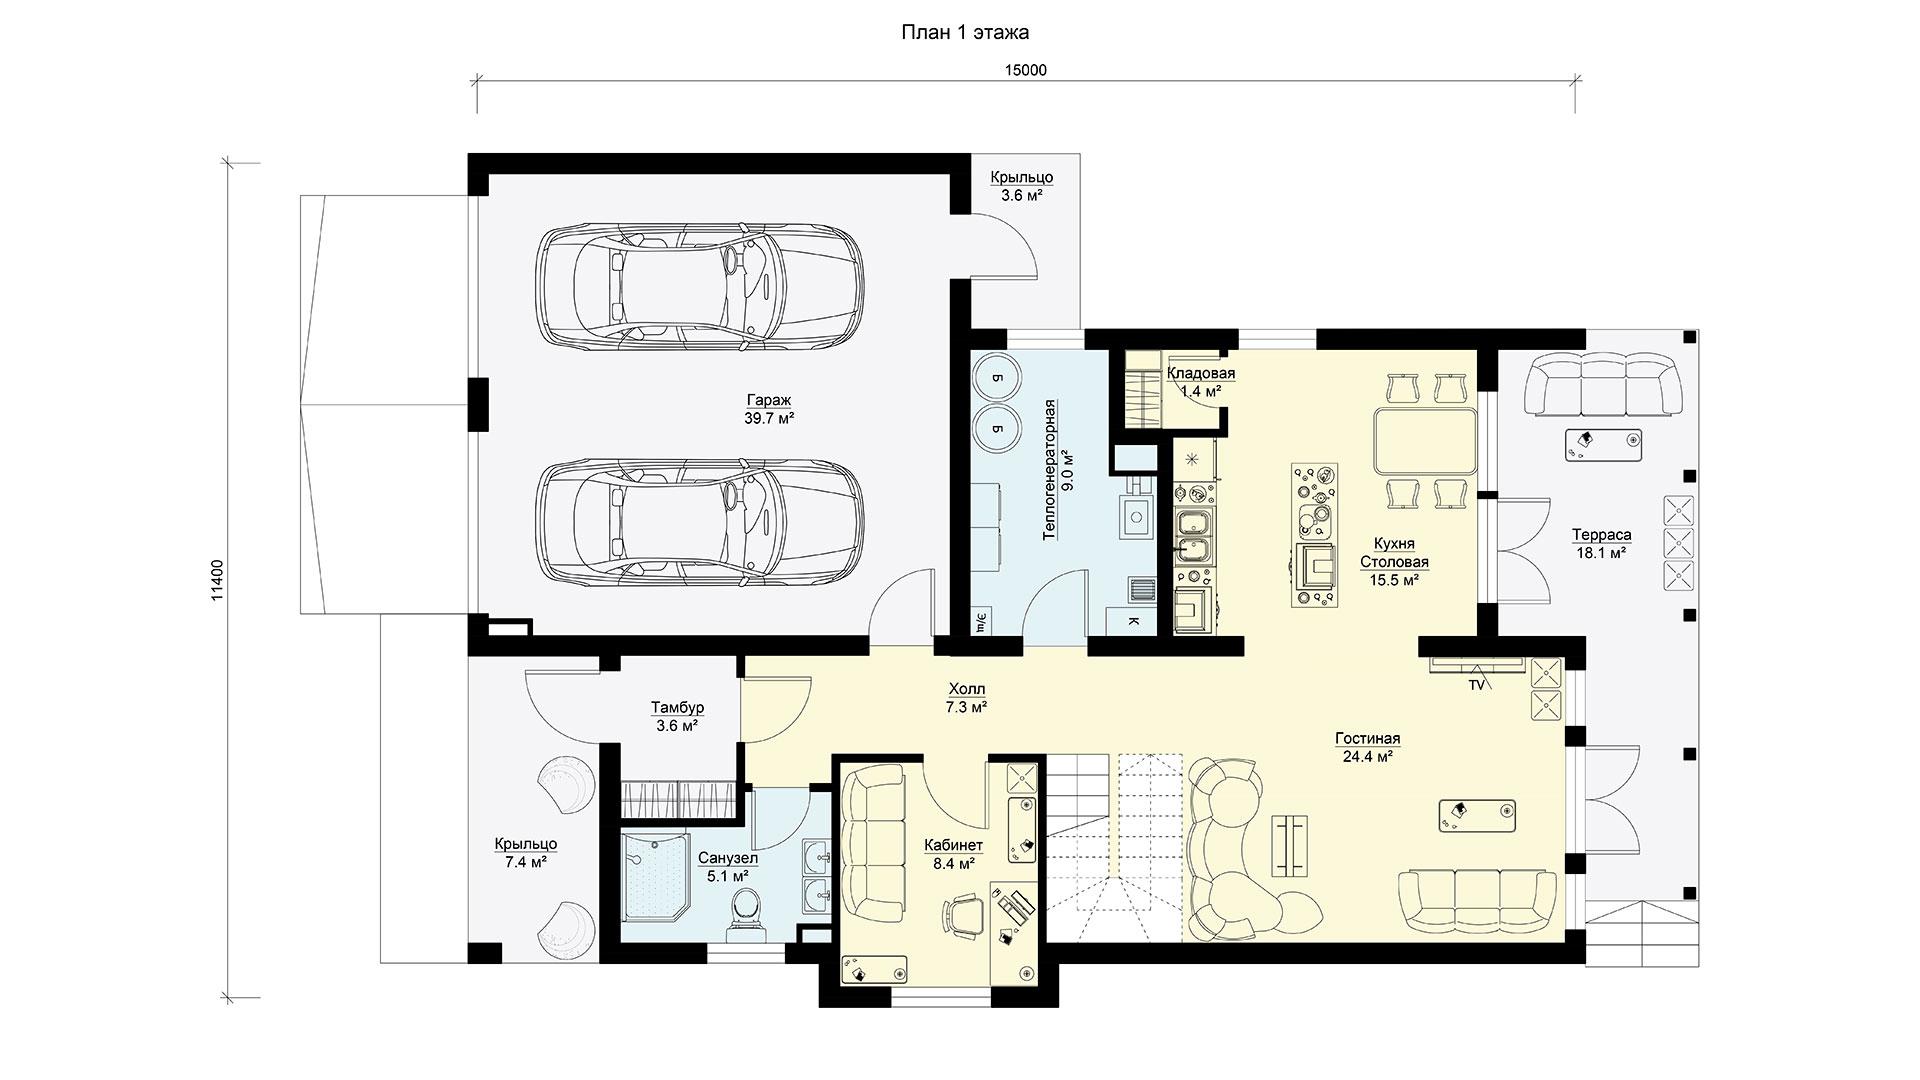 План первого этажа загородного дома БП-272.